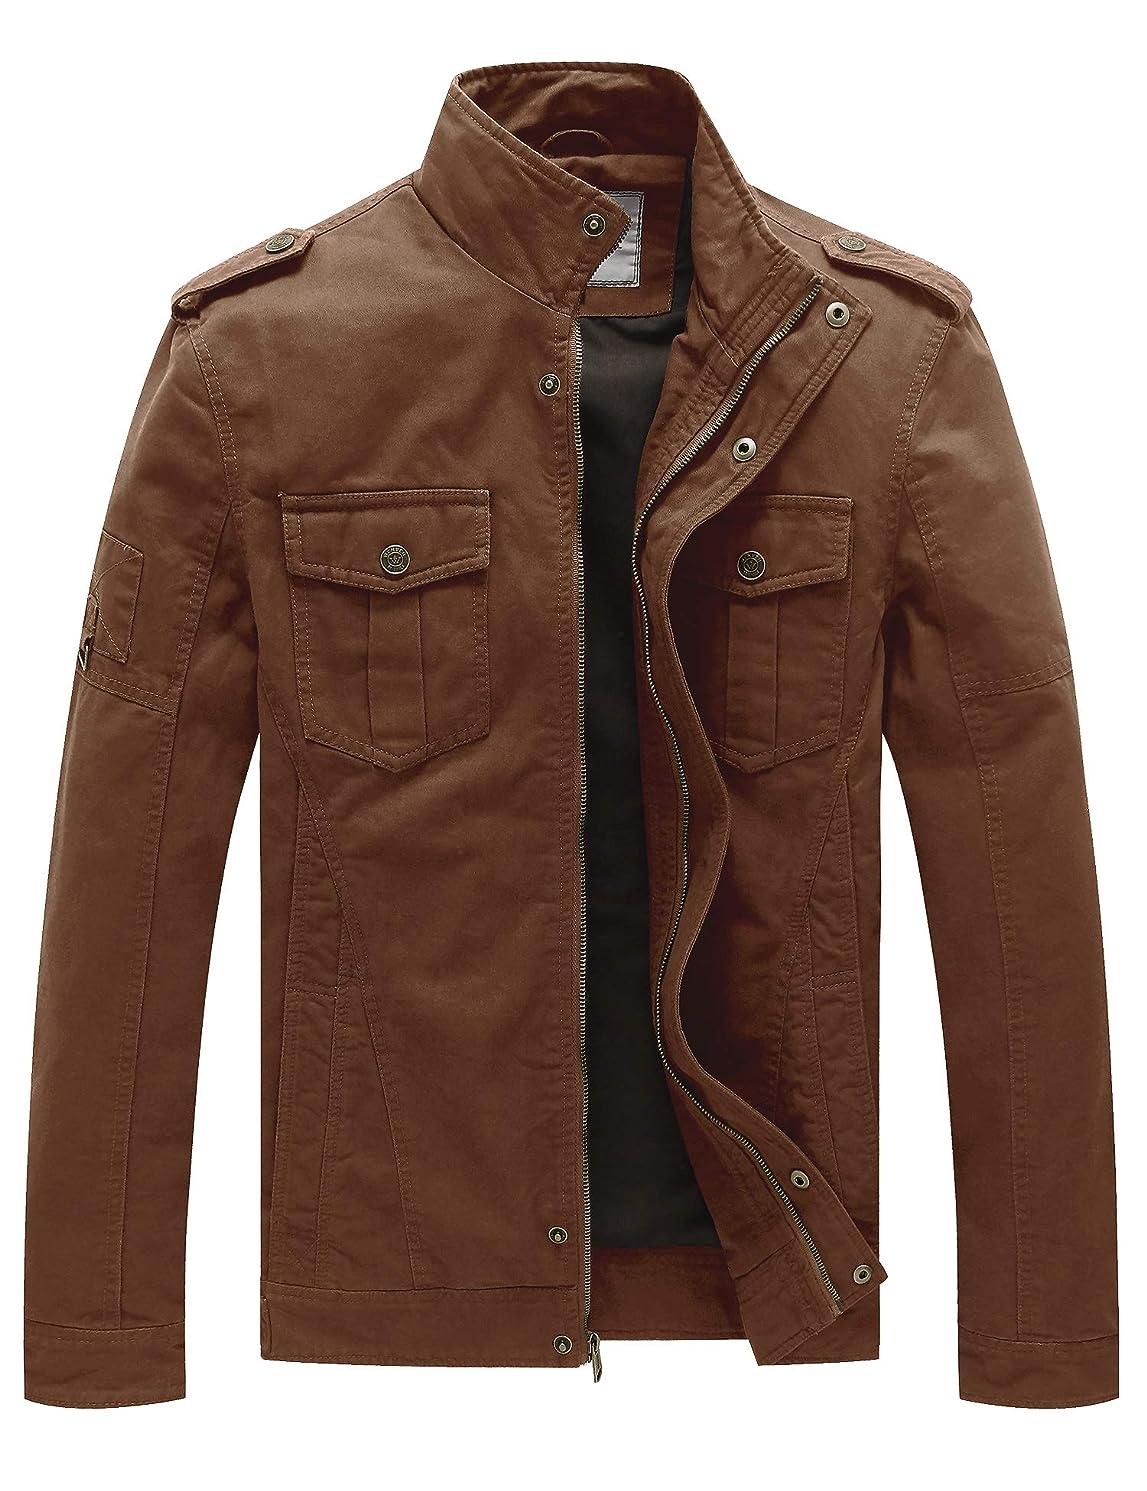 WenVen Men's Casual Cotton Military Jacket